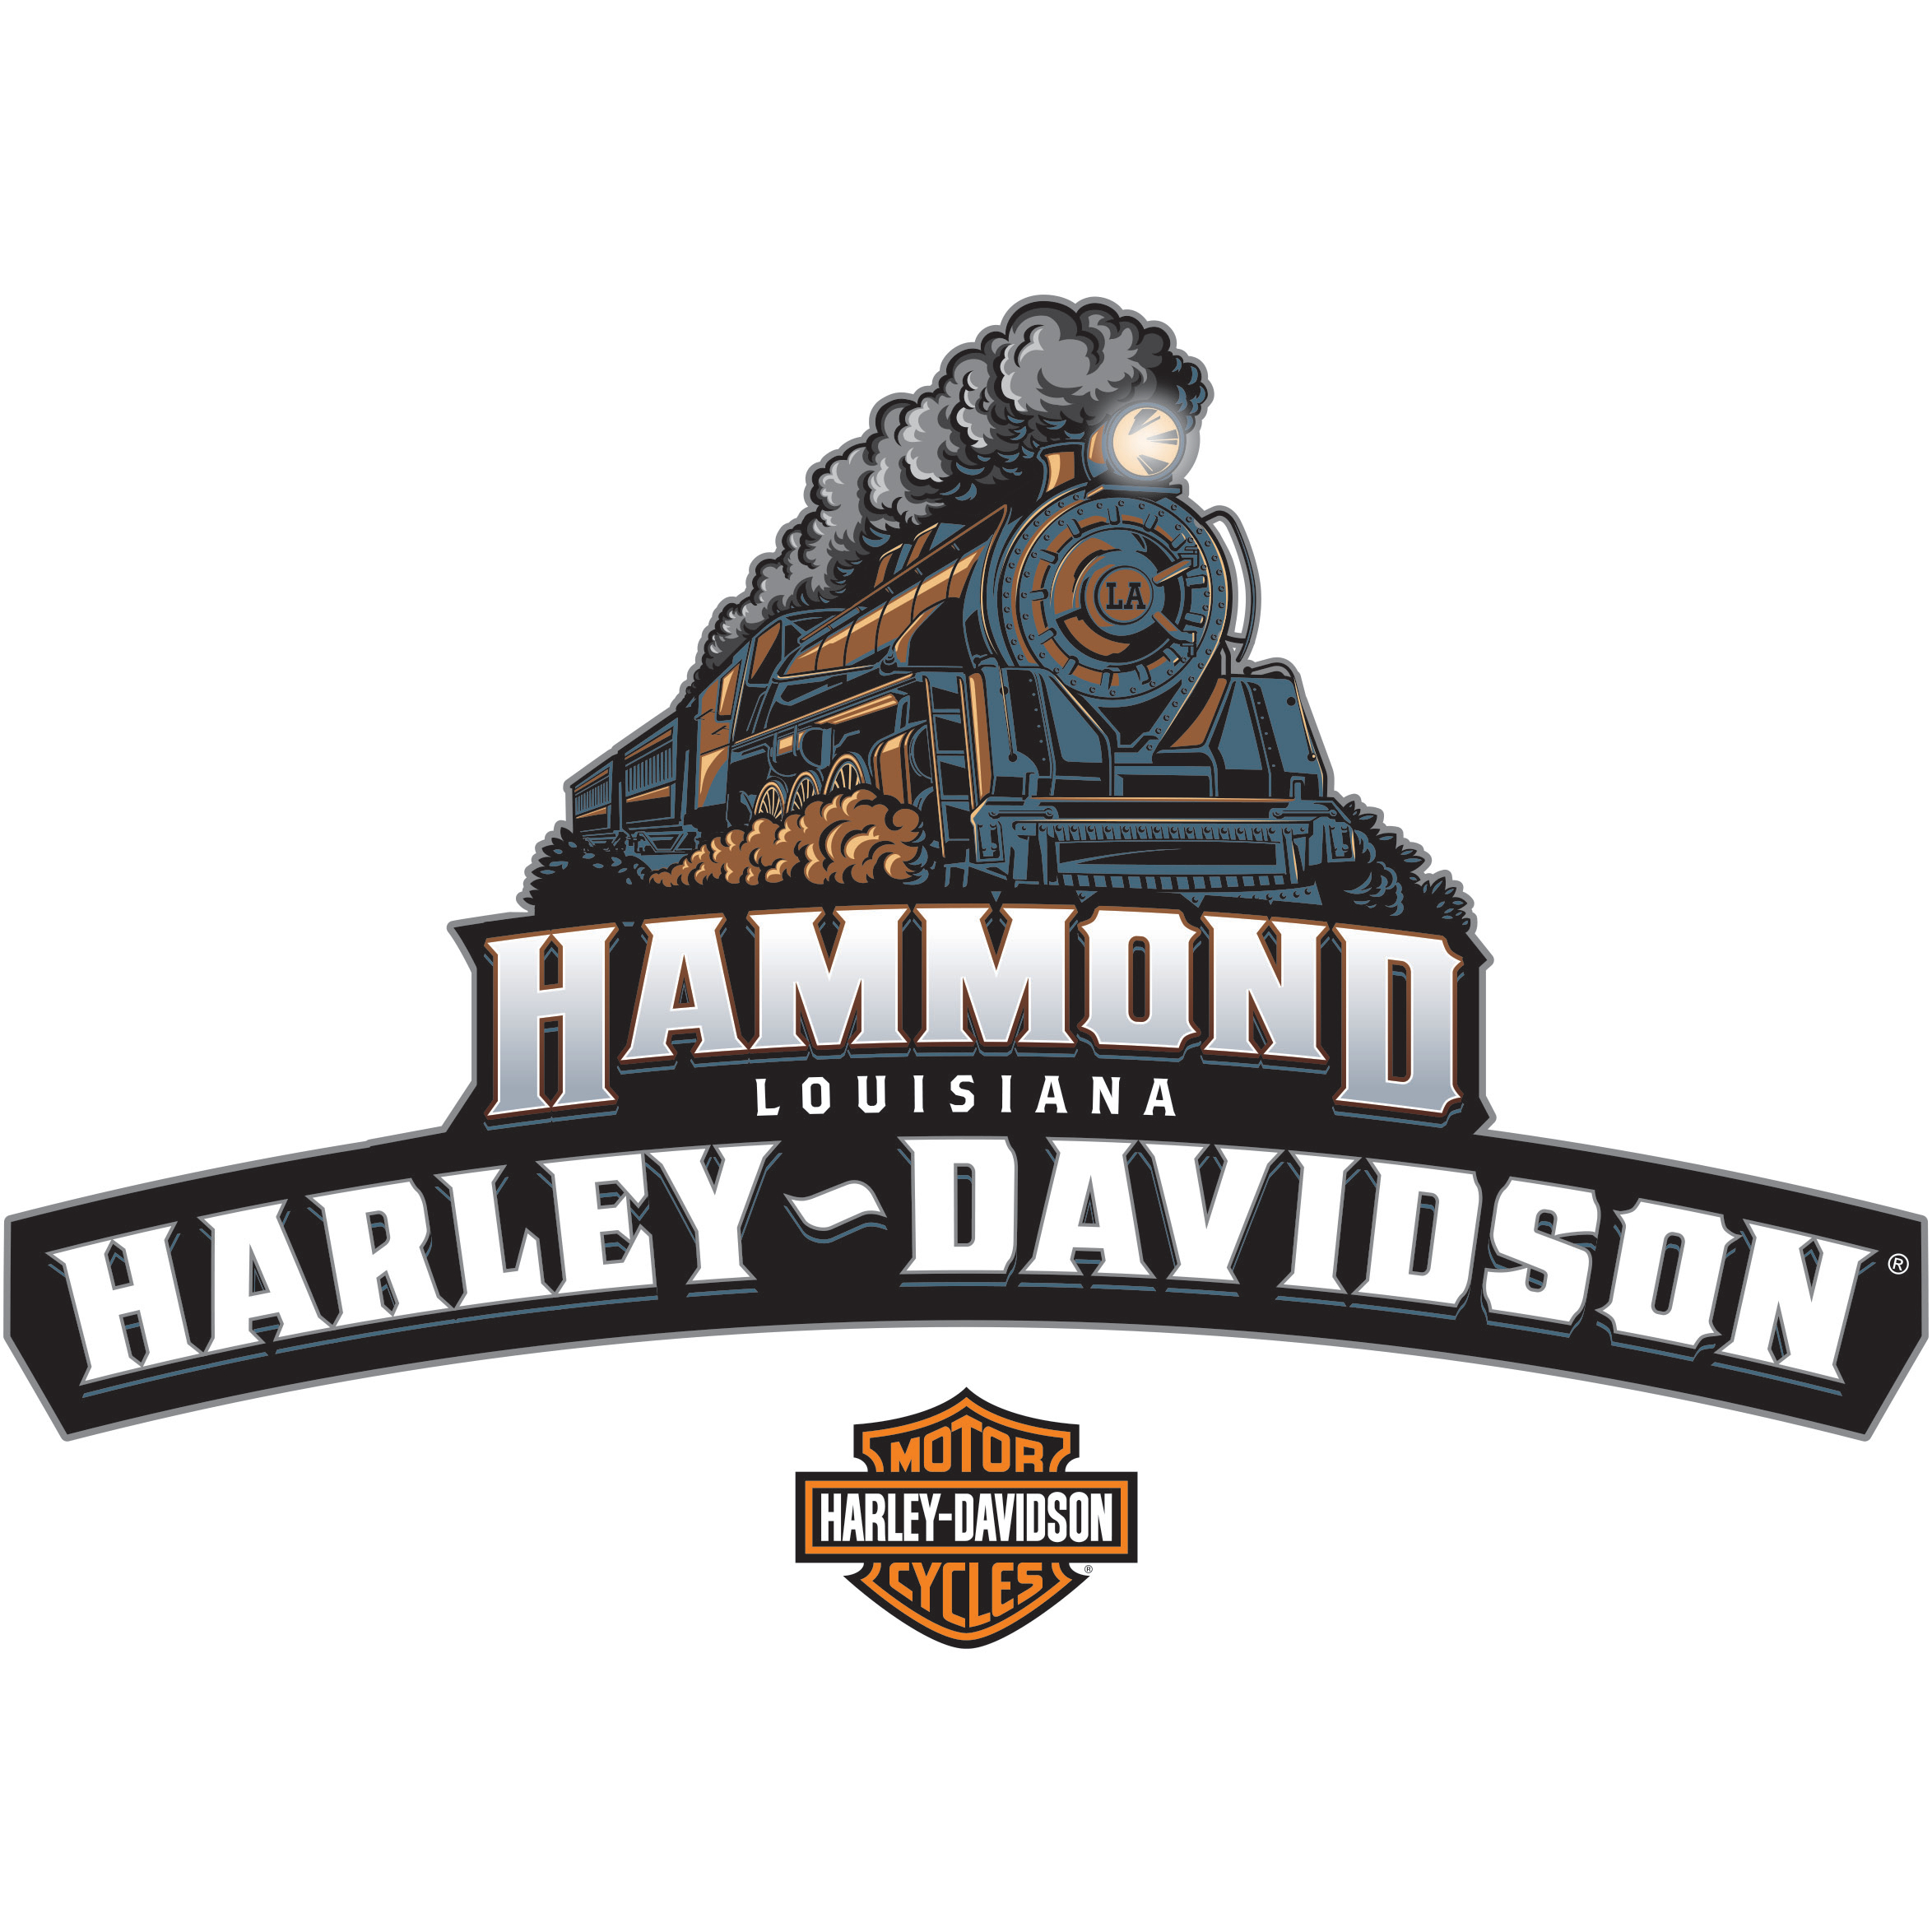 Hammond Harley-Davidson - ad image